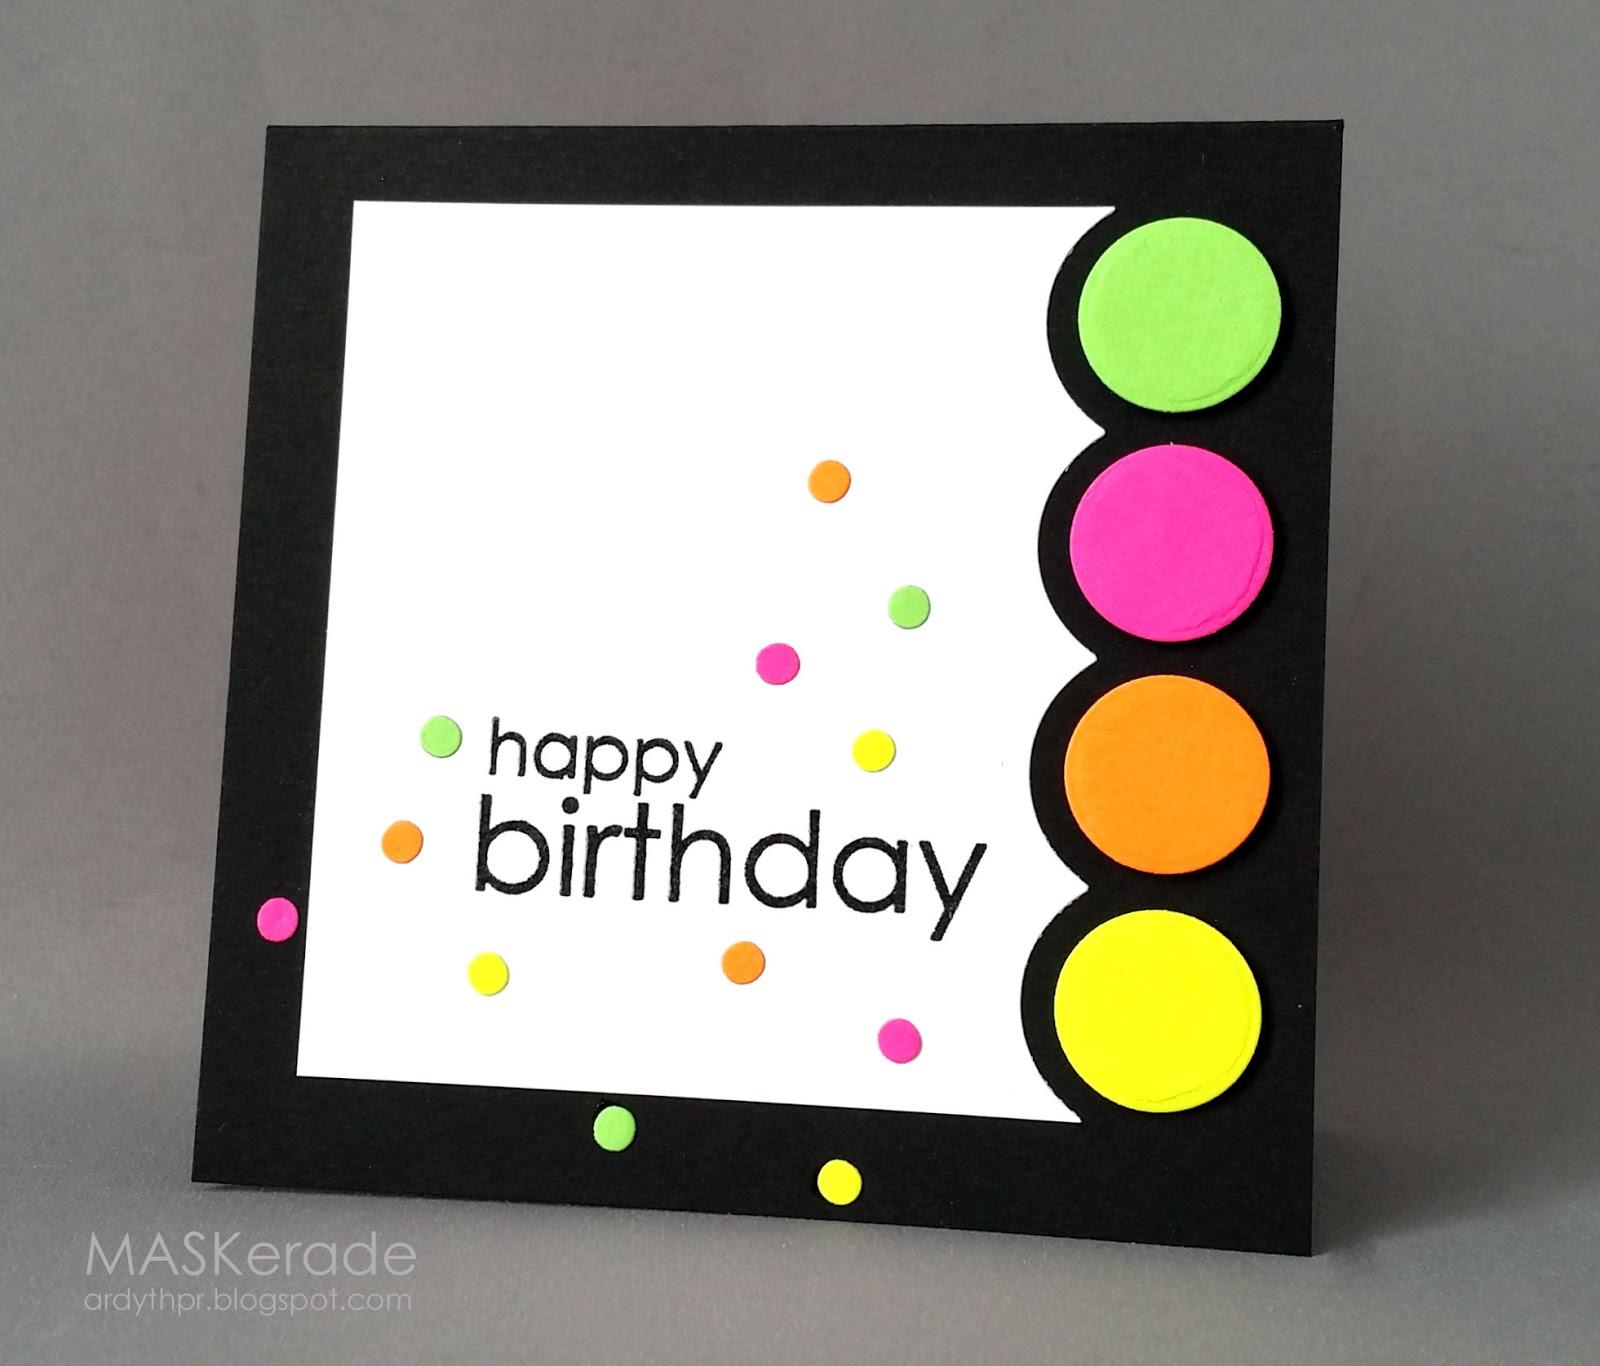 MASKerade: Happy Birthday, Kate